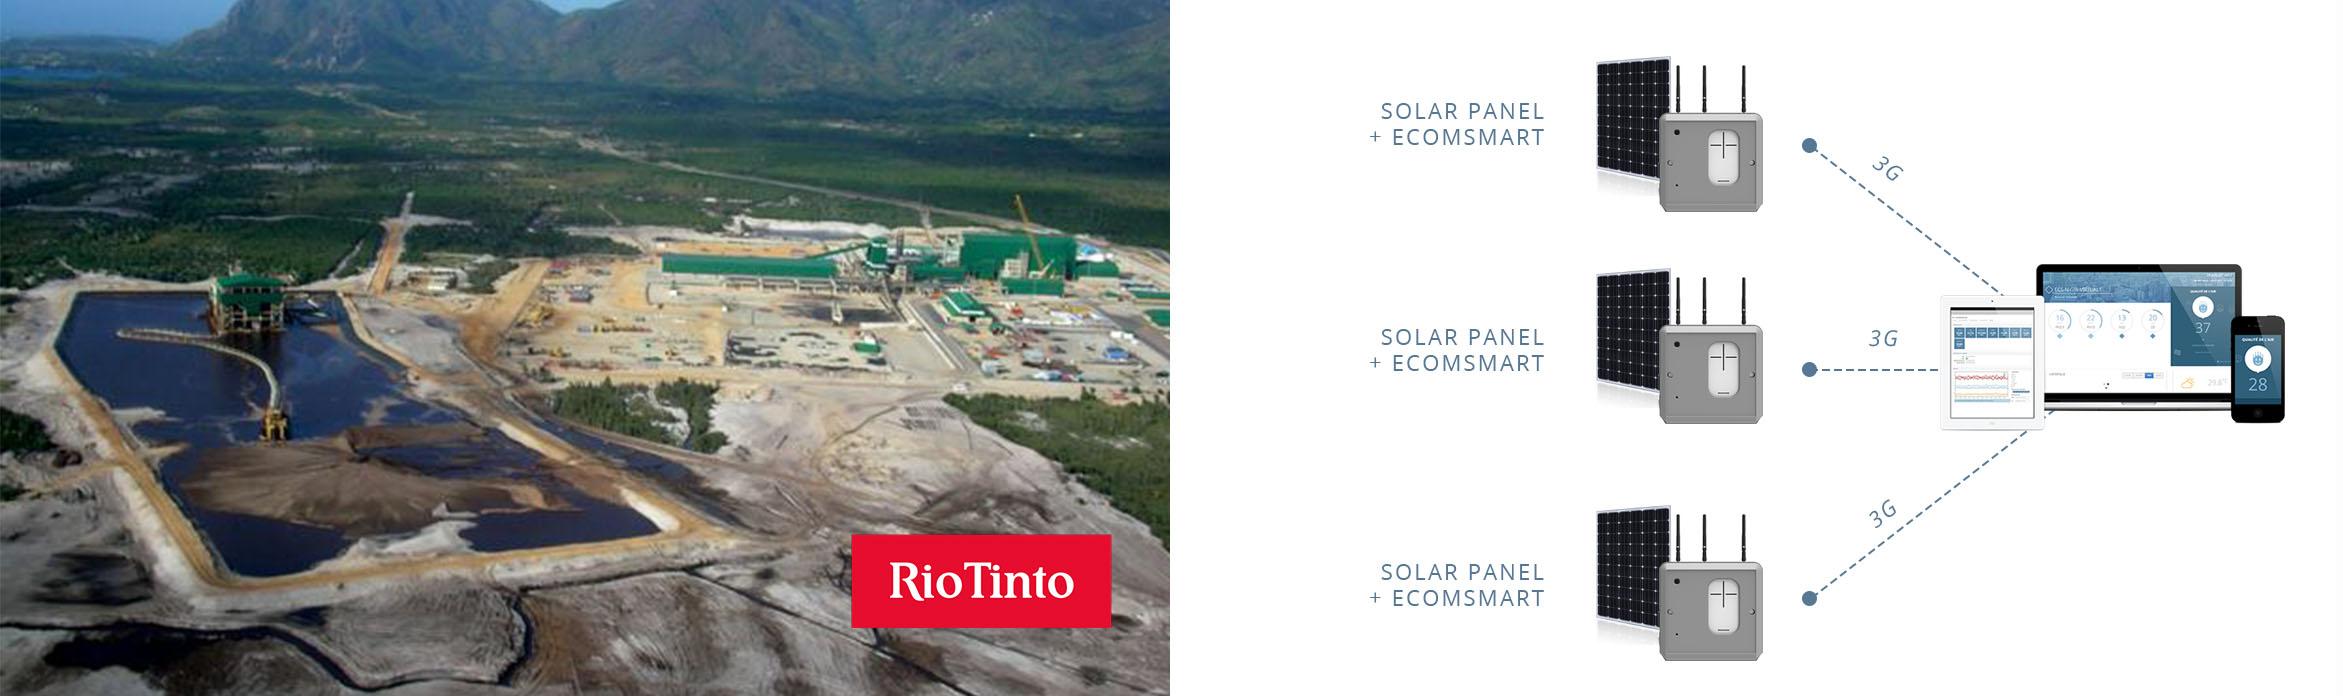 RioTinto Project